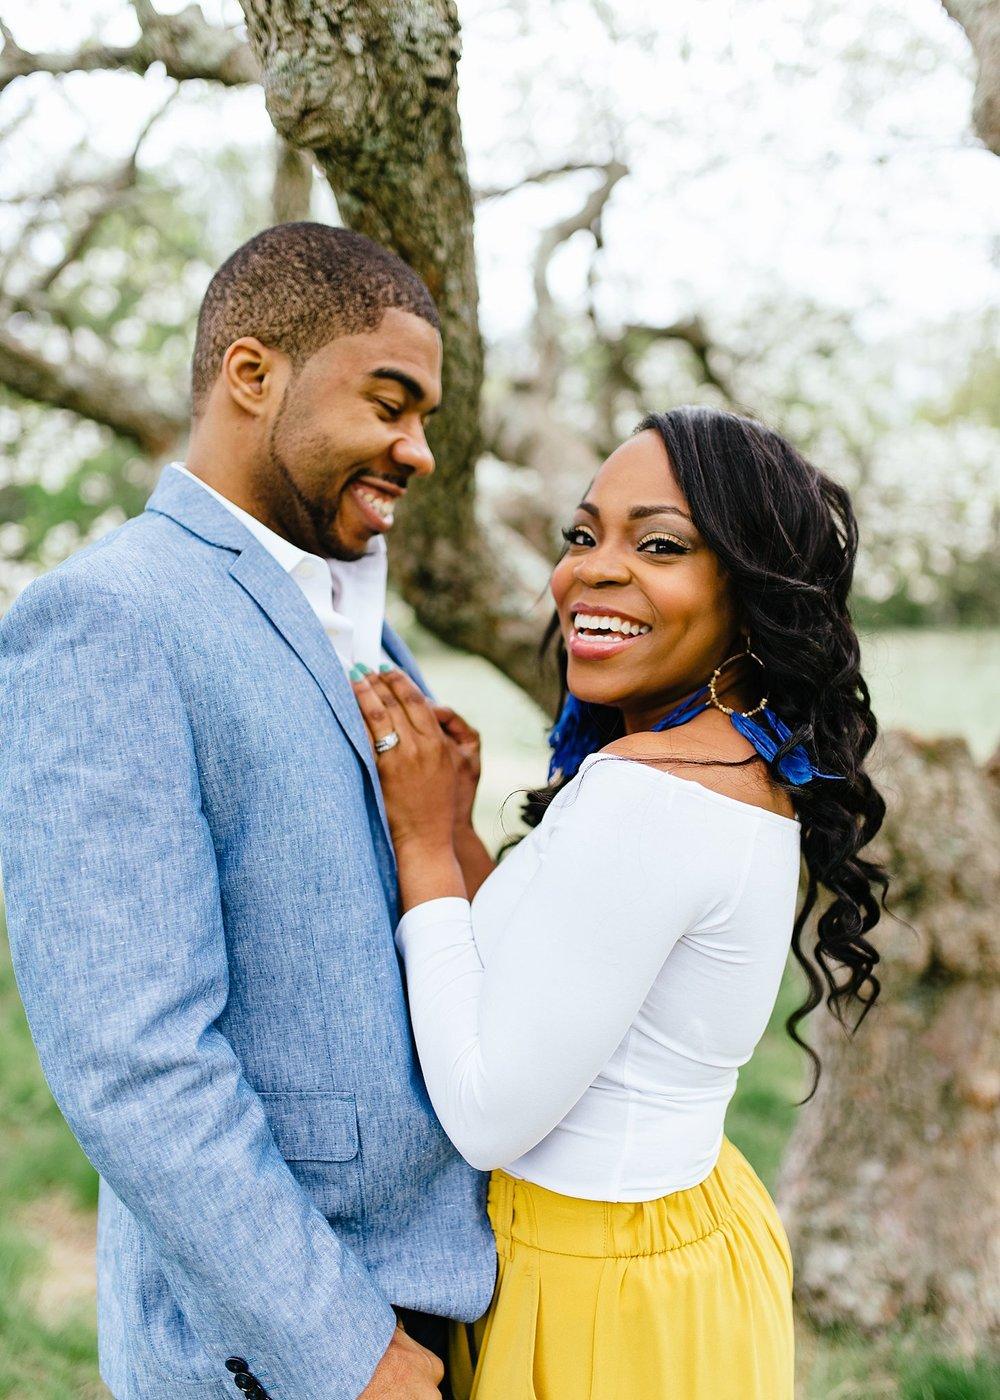 Engagement photos in Boston